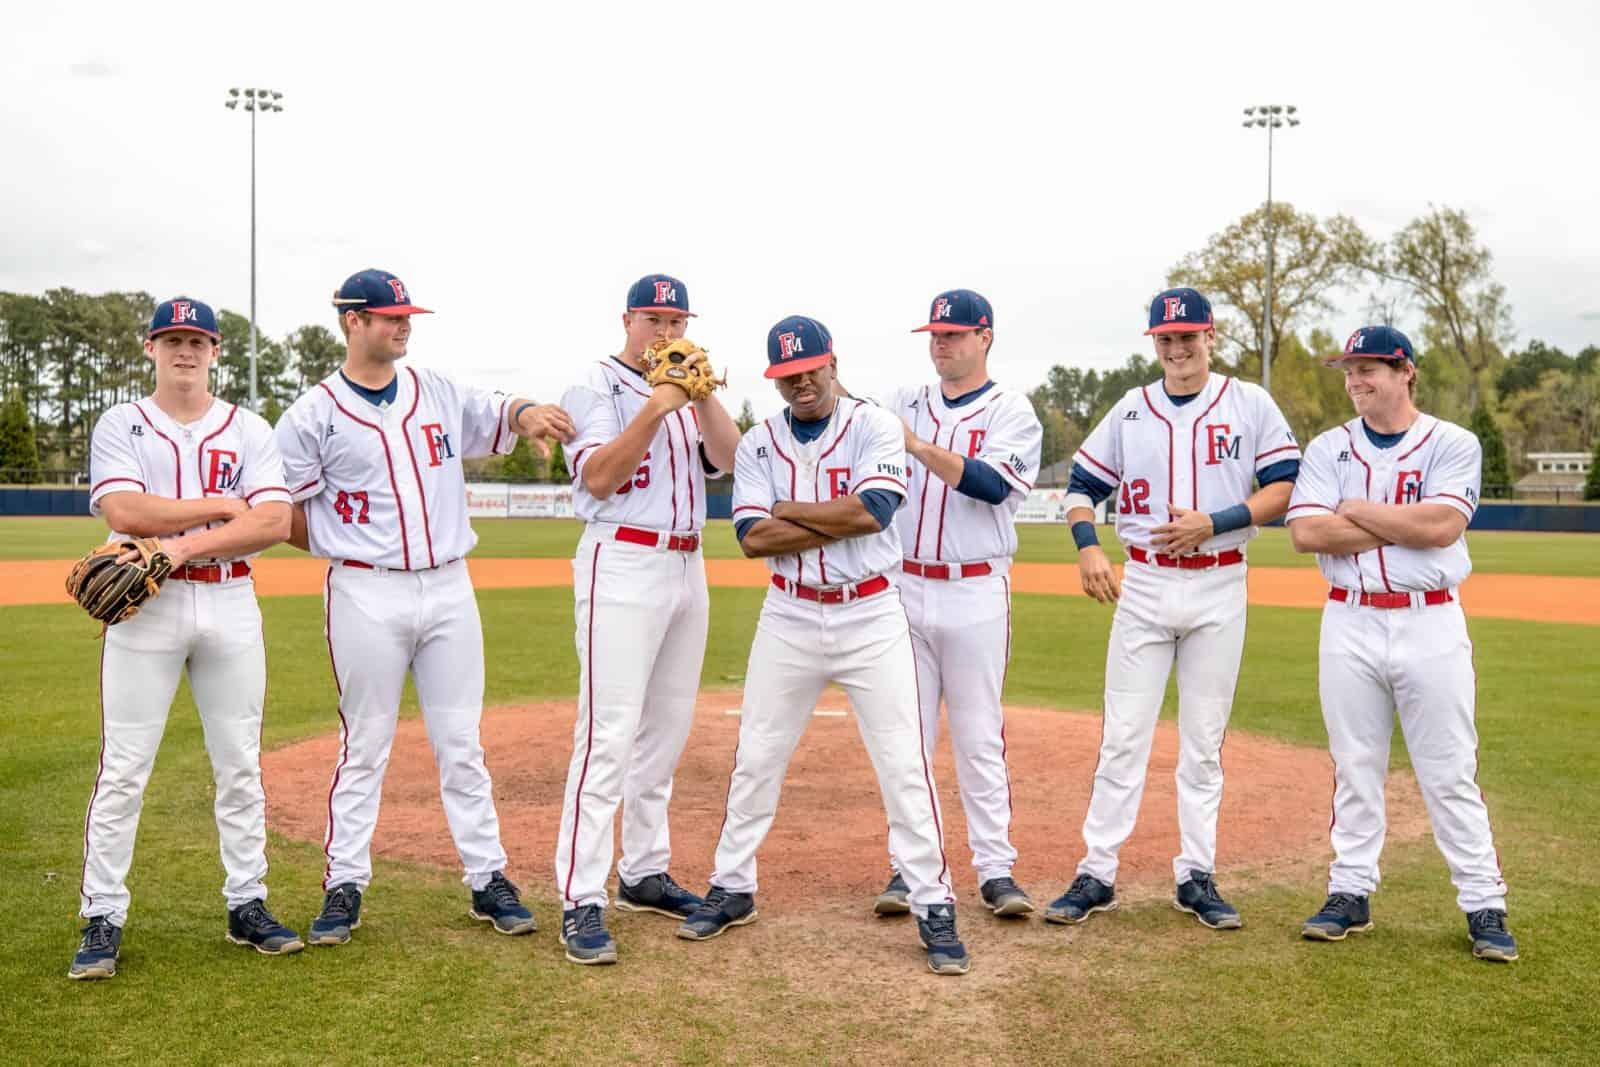 FMU Baseball vs Newberry